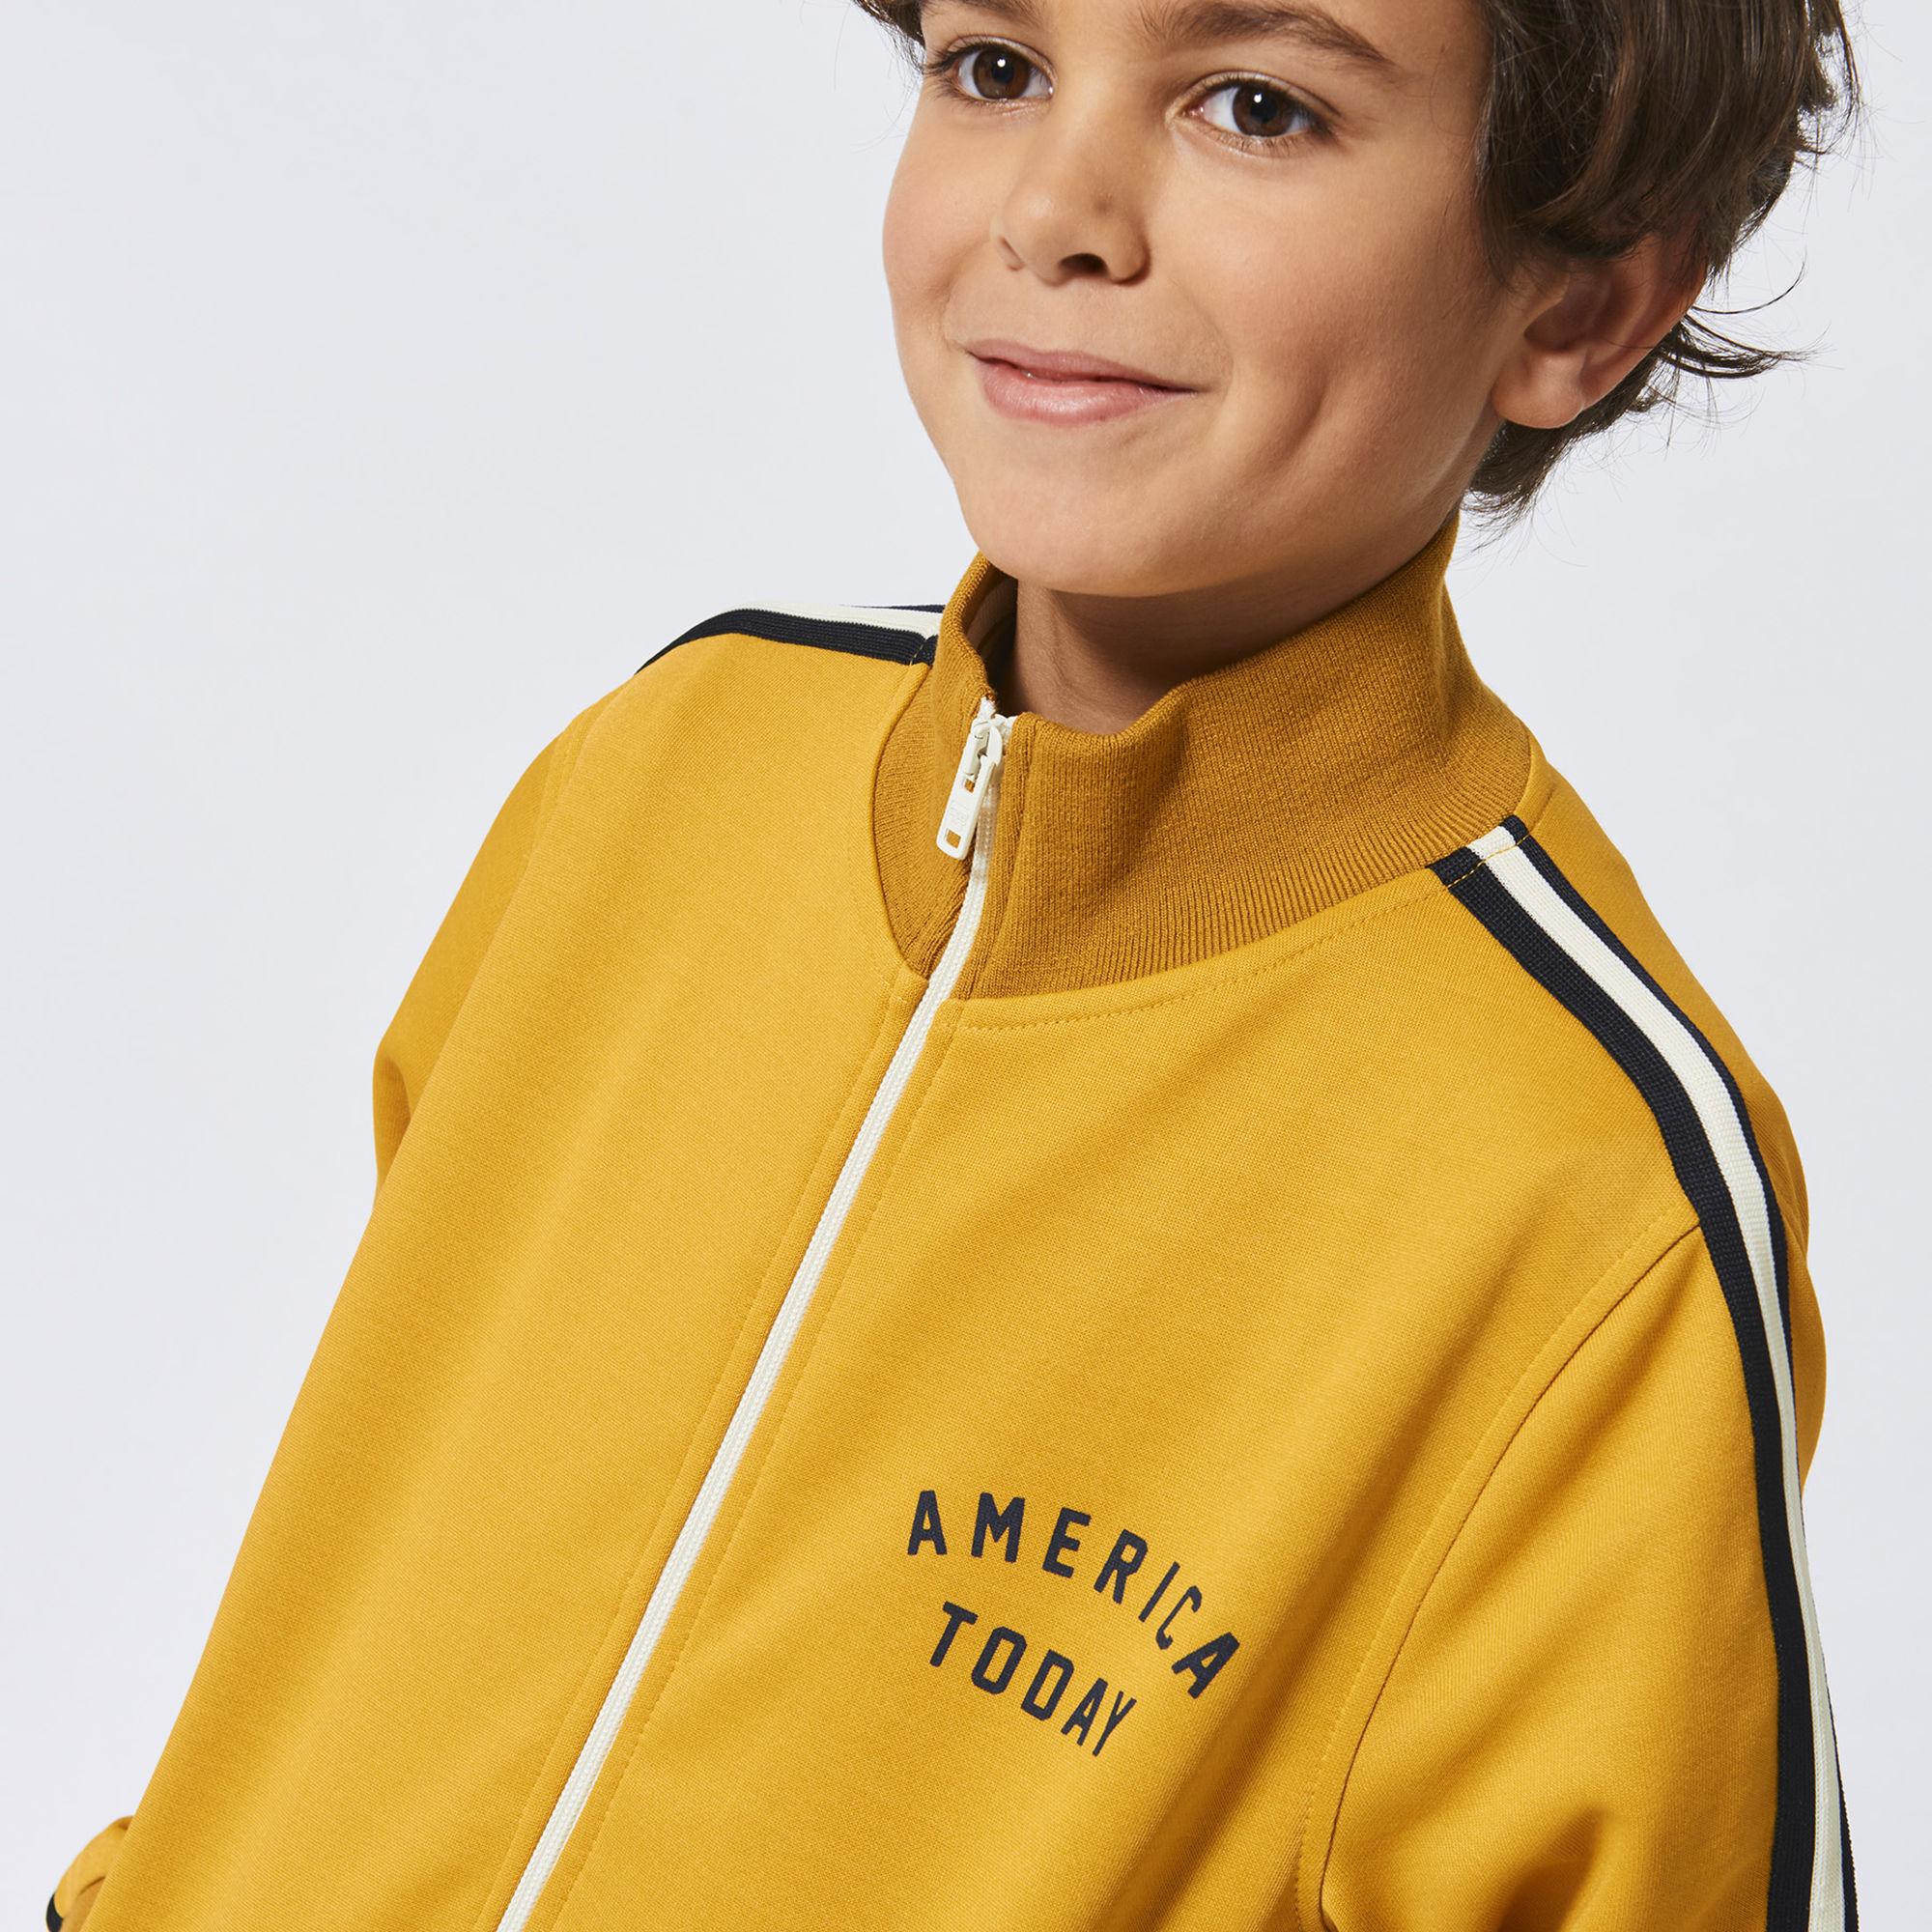 geel jongensvest, geel vest, gele kinderkleding